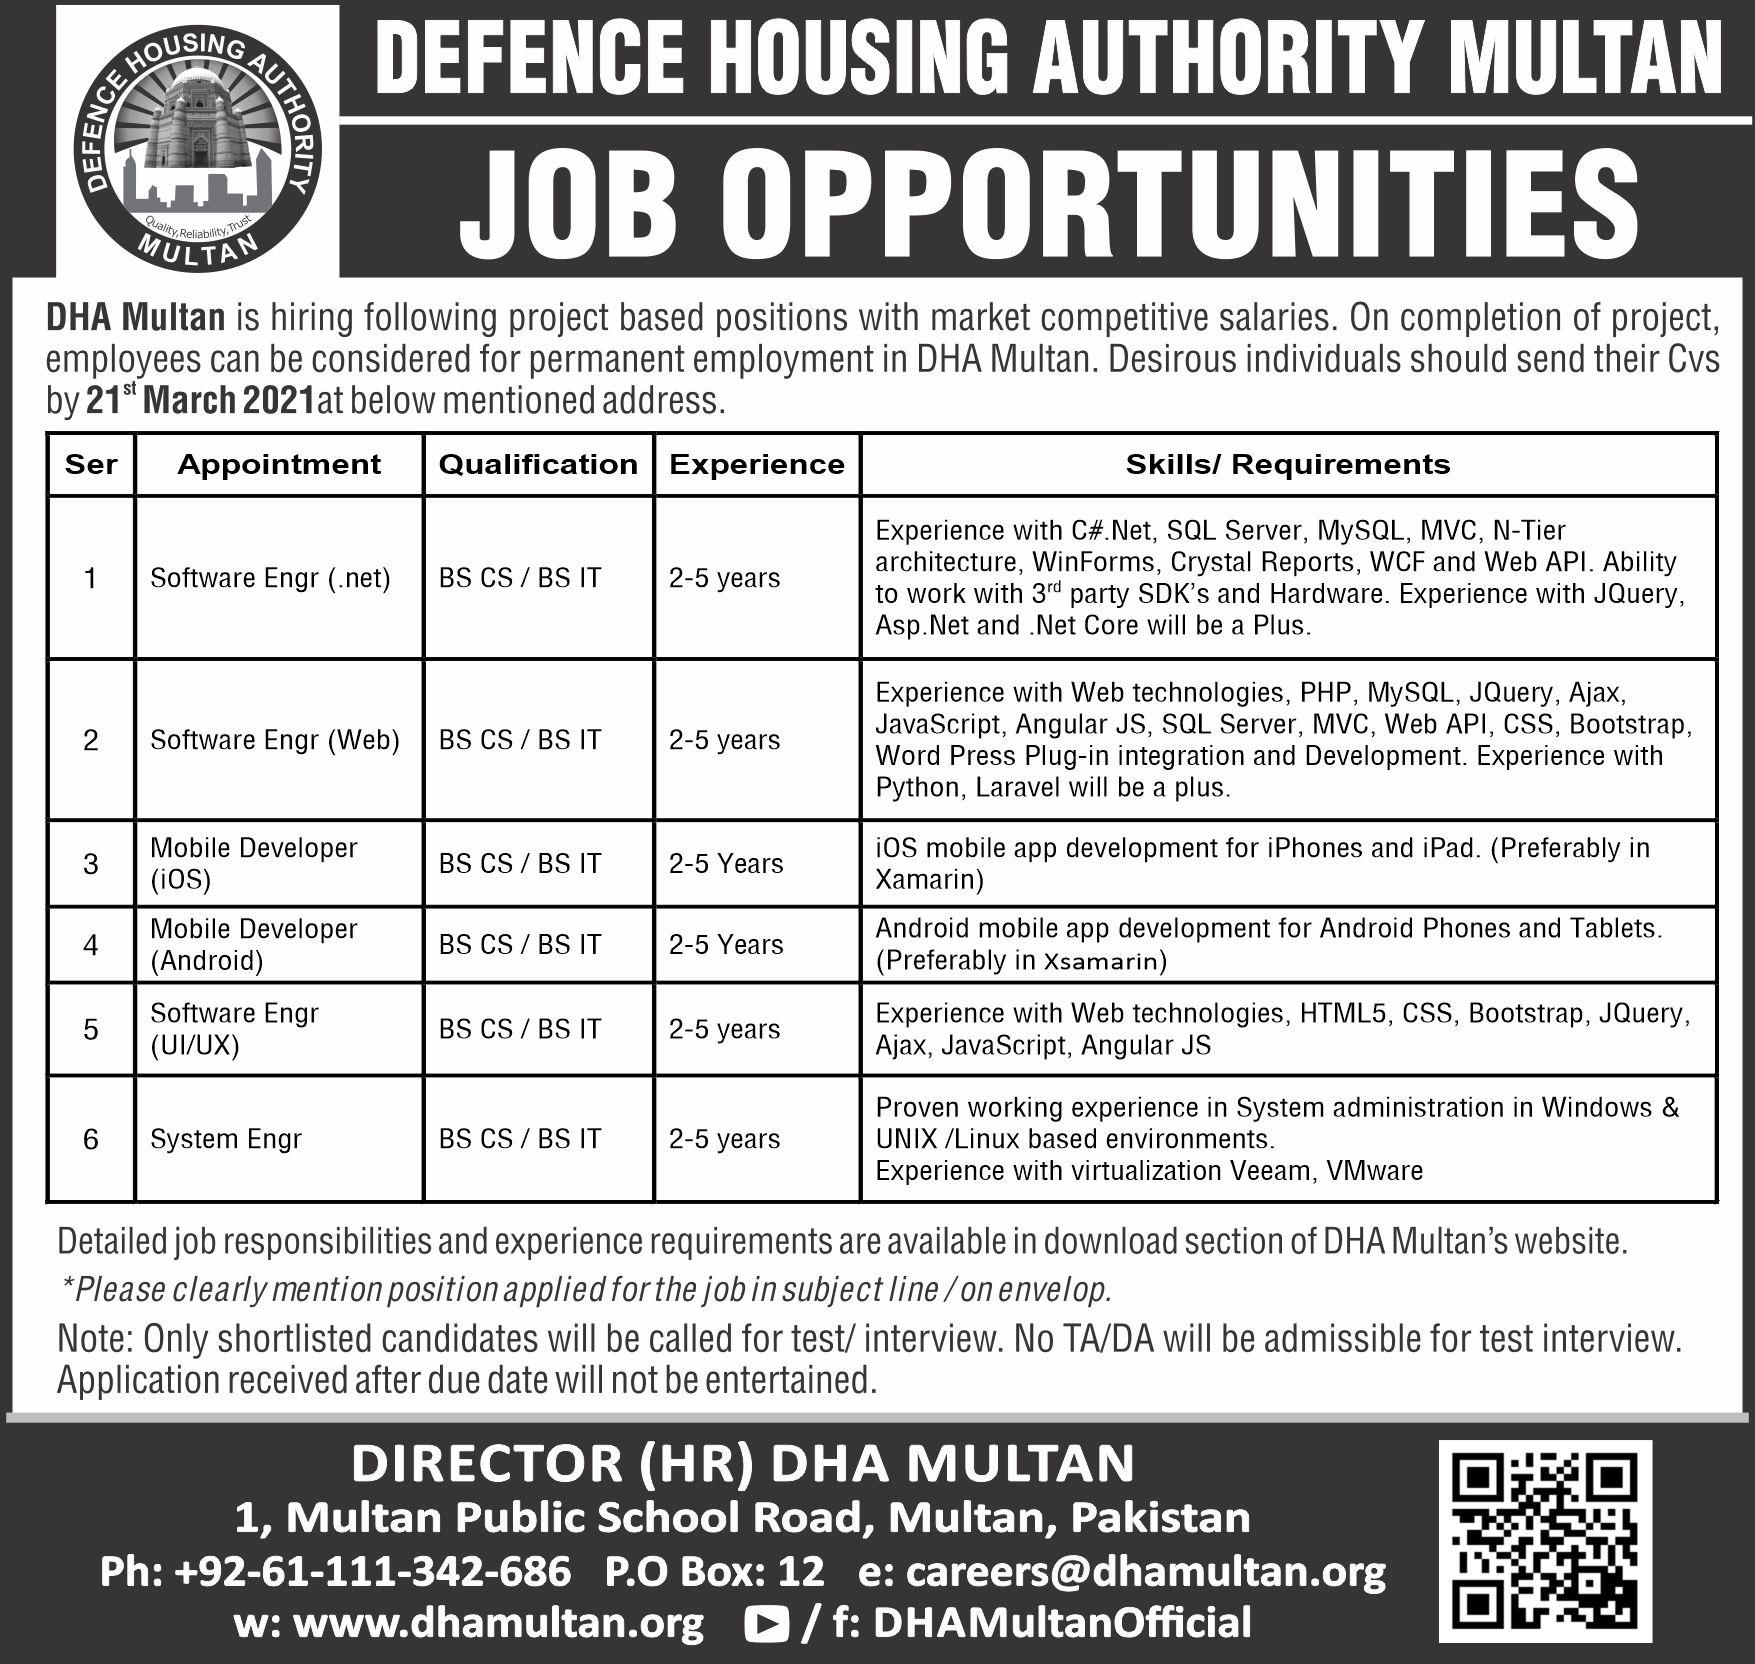 DHA Defense Housing Authority Multan Jobs 2021| Latest jobs in DHA| Apply Now